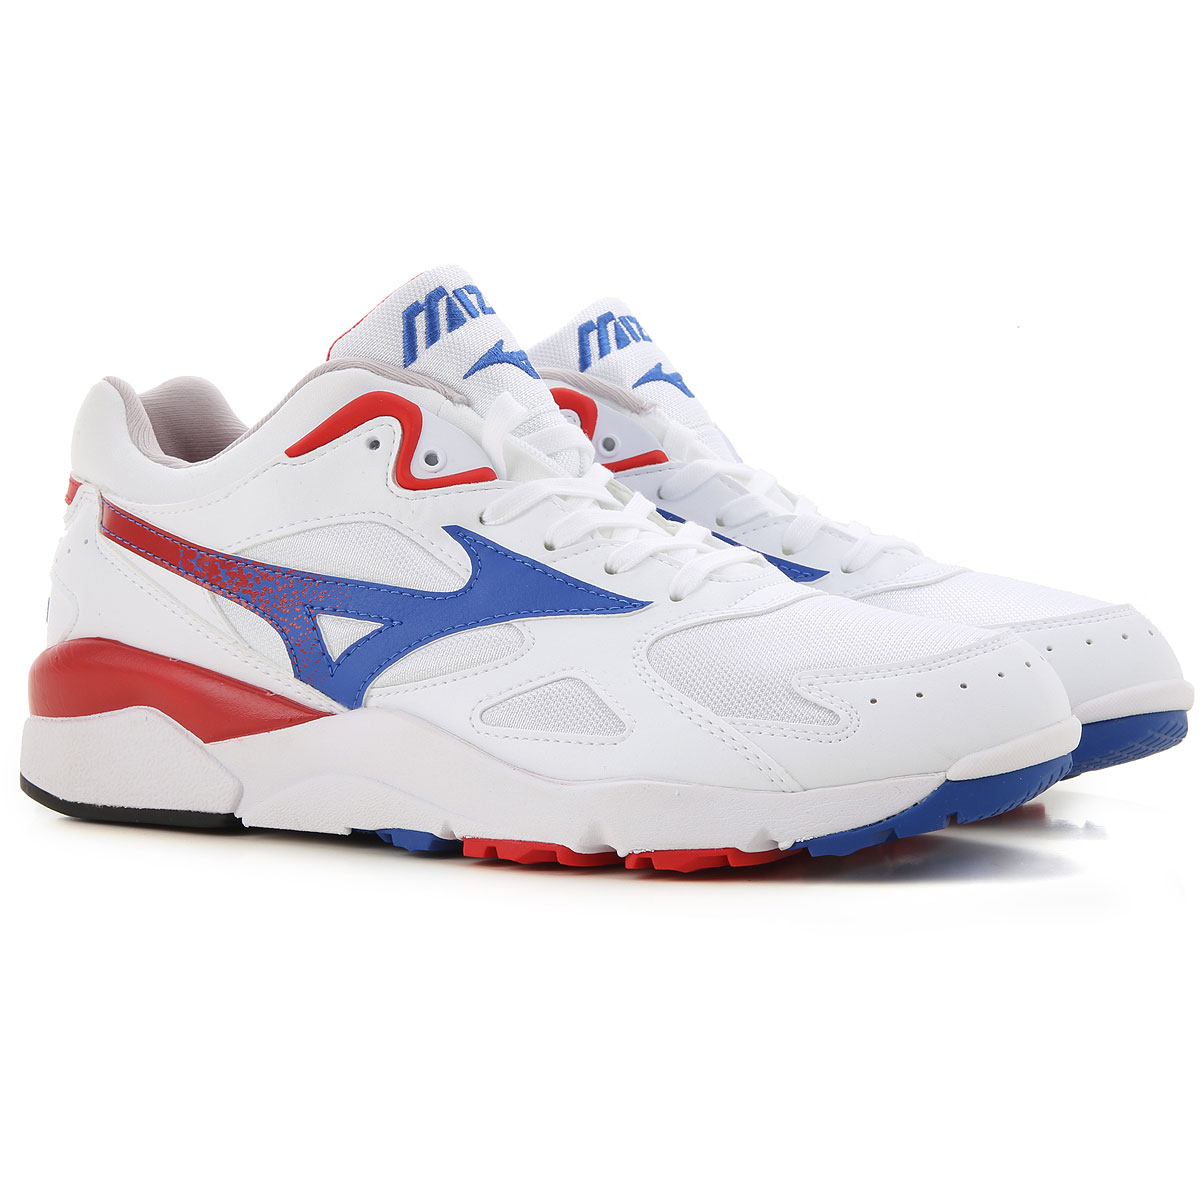 Mizuno Sneakers for Men, White, Leather, 2019, 9